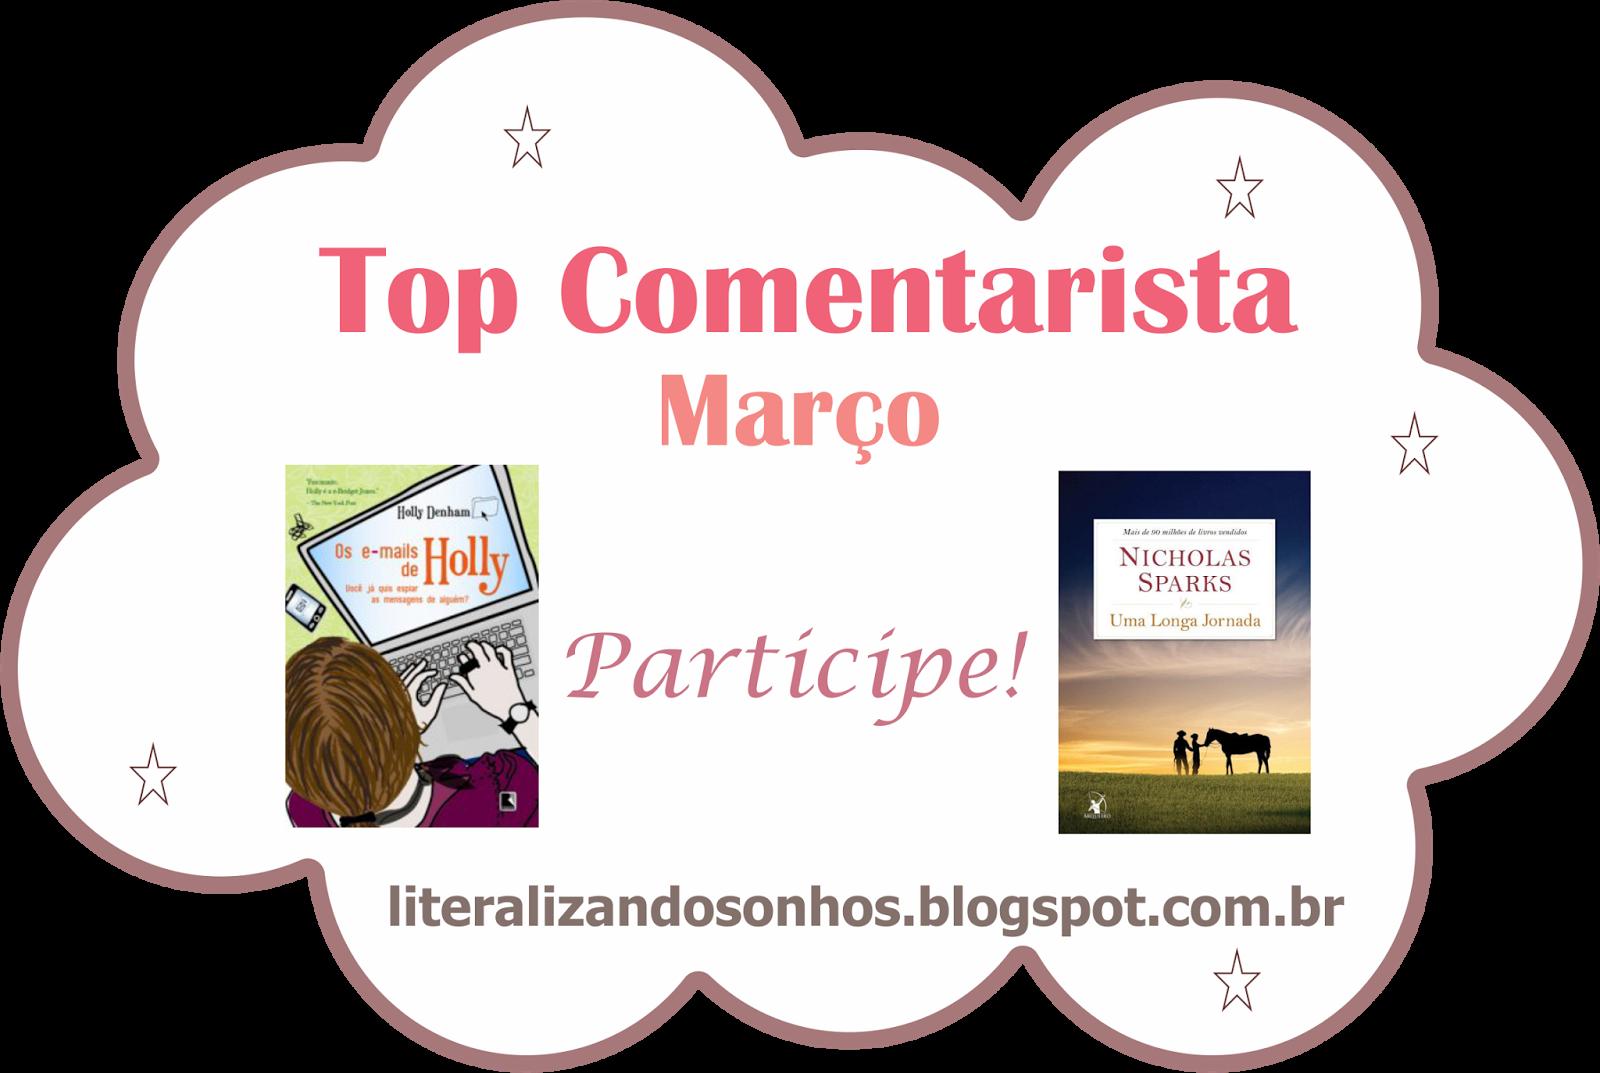 http://literalizandosonhos.blogspot.com.br/2015/03/top-comentarista-5-marco2015.html